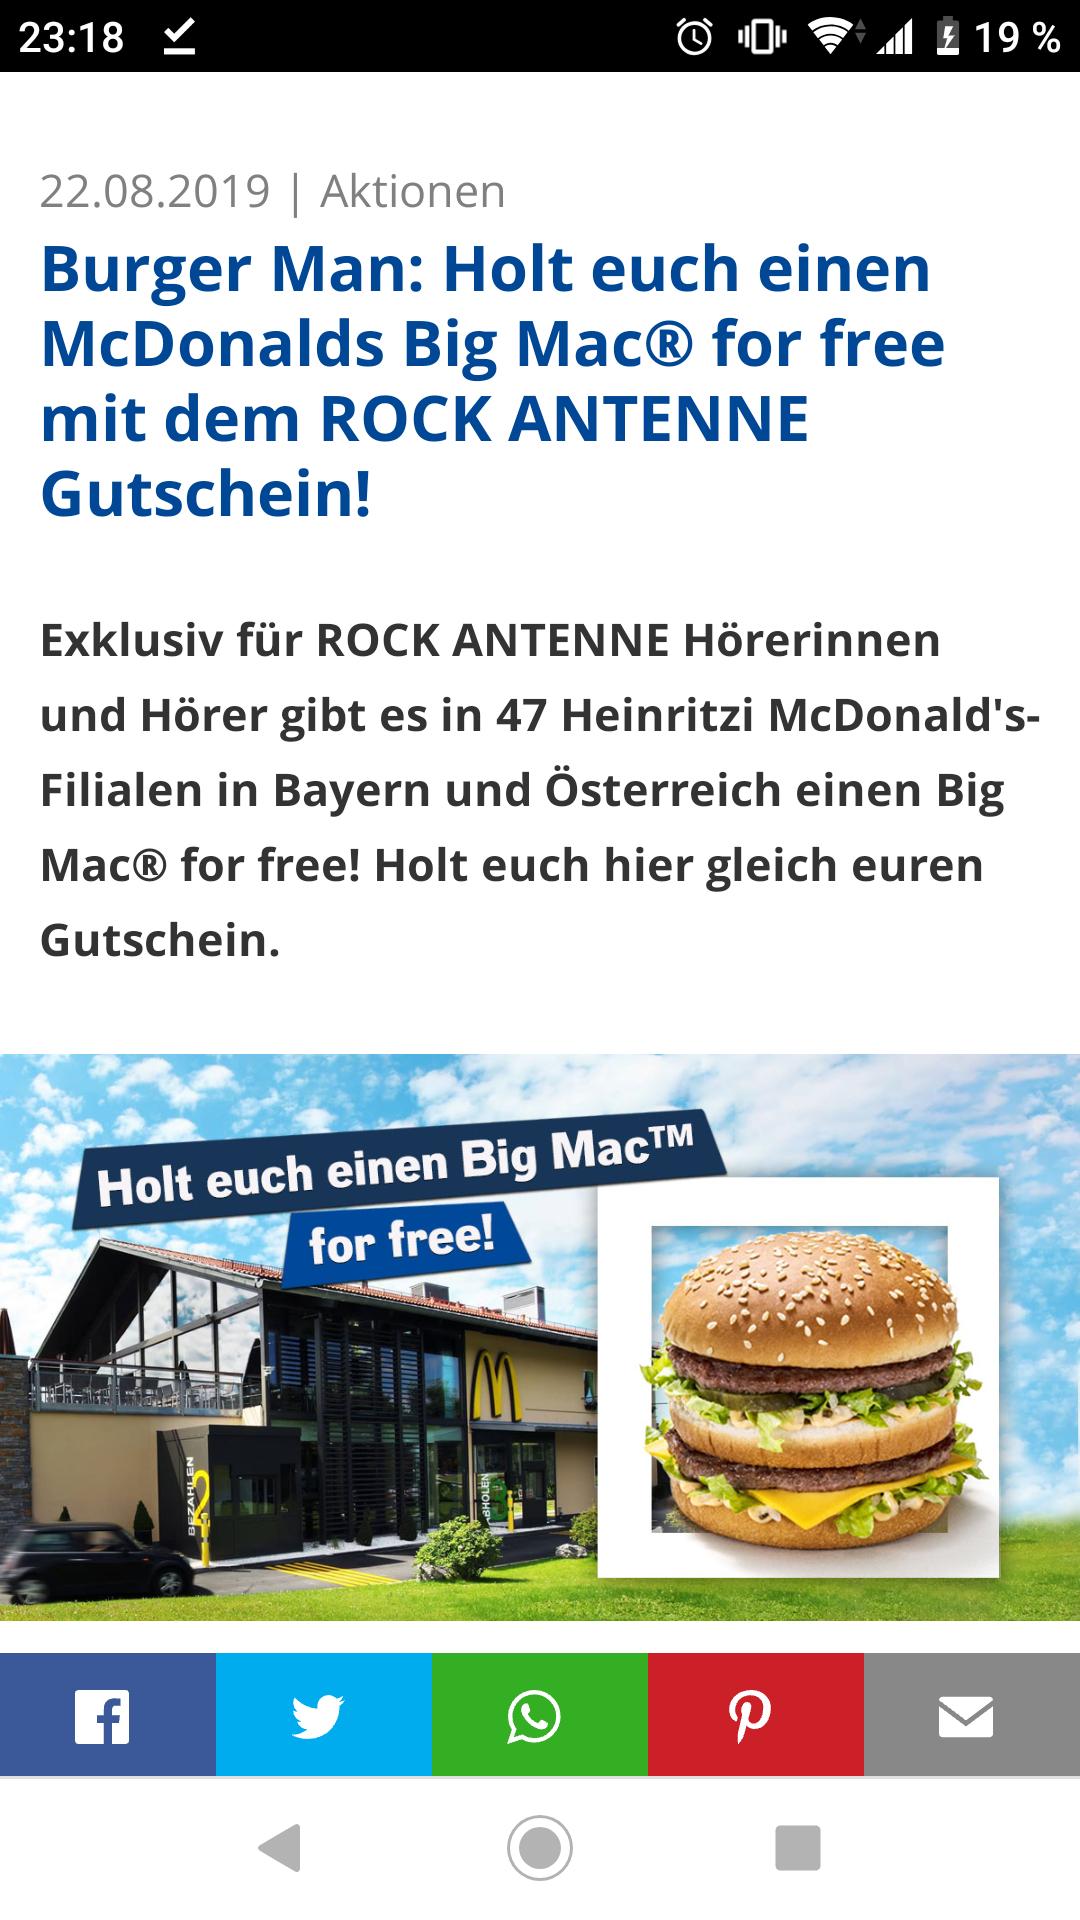 MC DONALDS BIG MAC FOR FREE von Rock Antenne!  [Lokal/Regional]